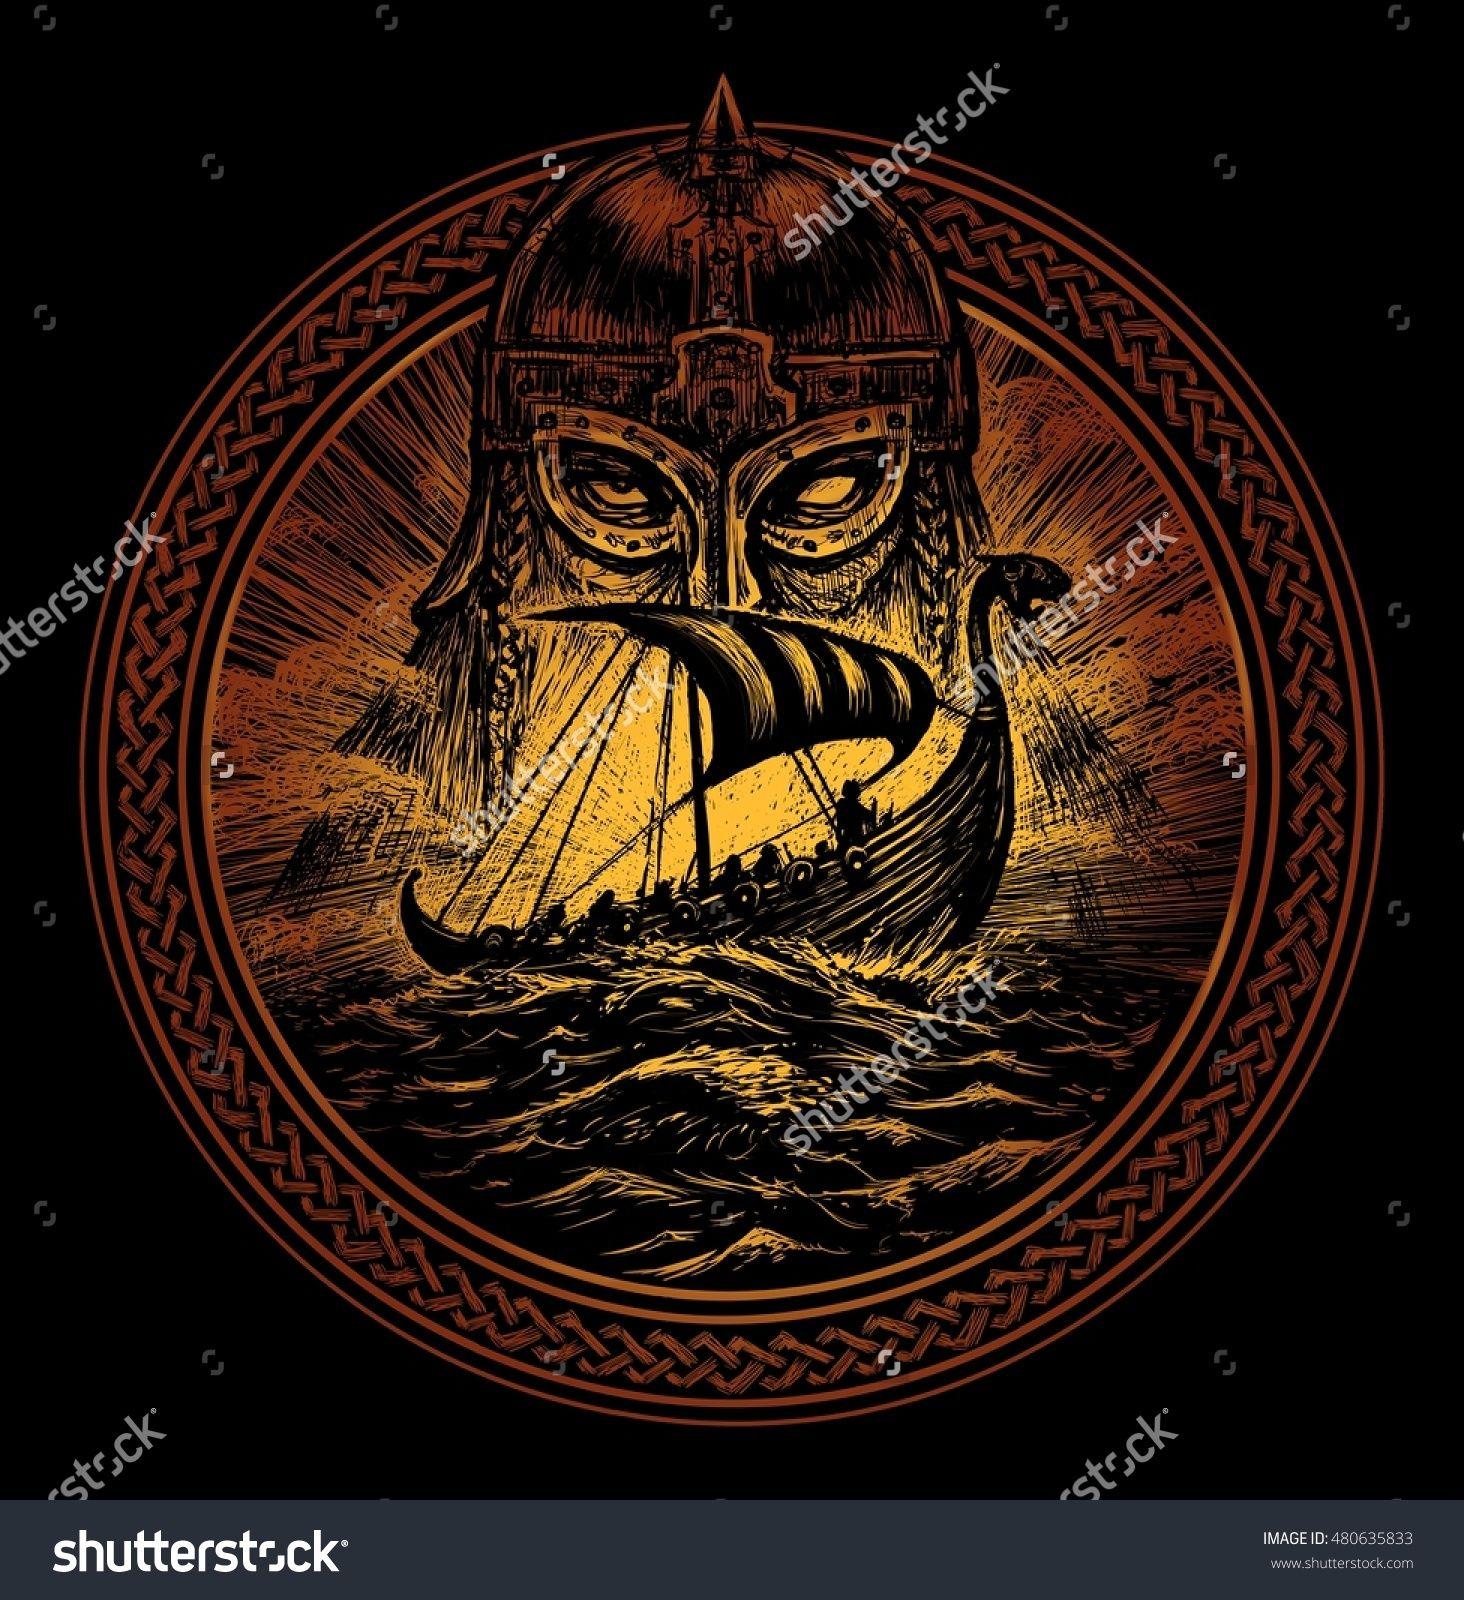 god odin storm sea and drakkar illustration of a circle viking emblem viking ship norse god. Black Bedroom Furniture Sets. Home Design Ideas